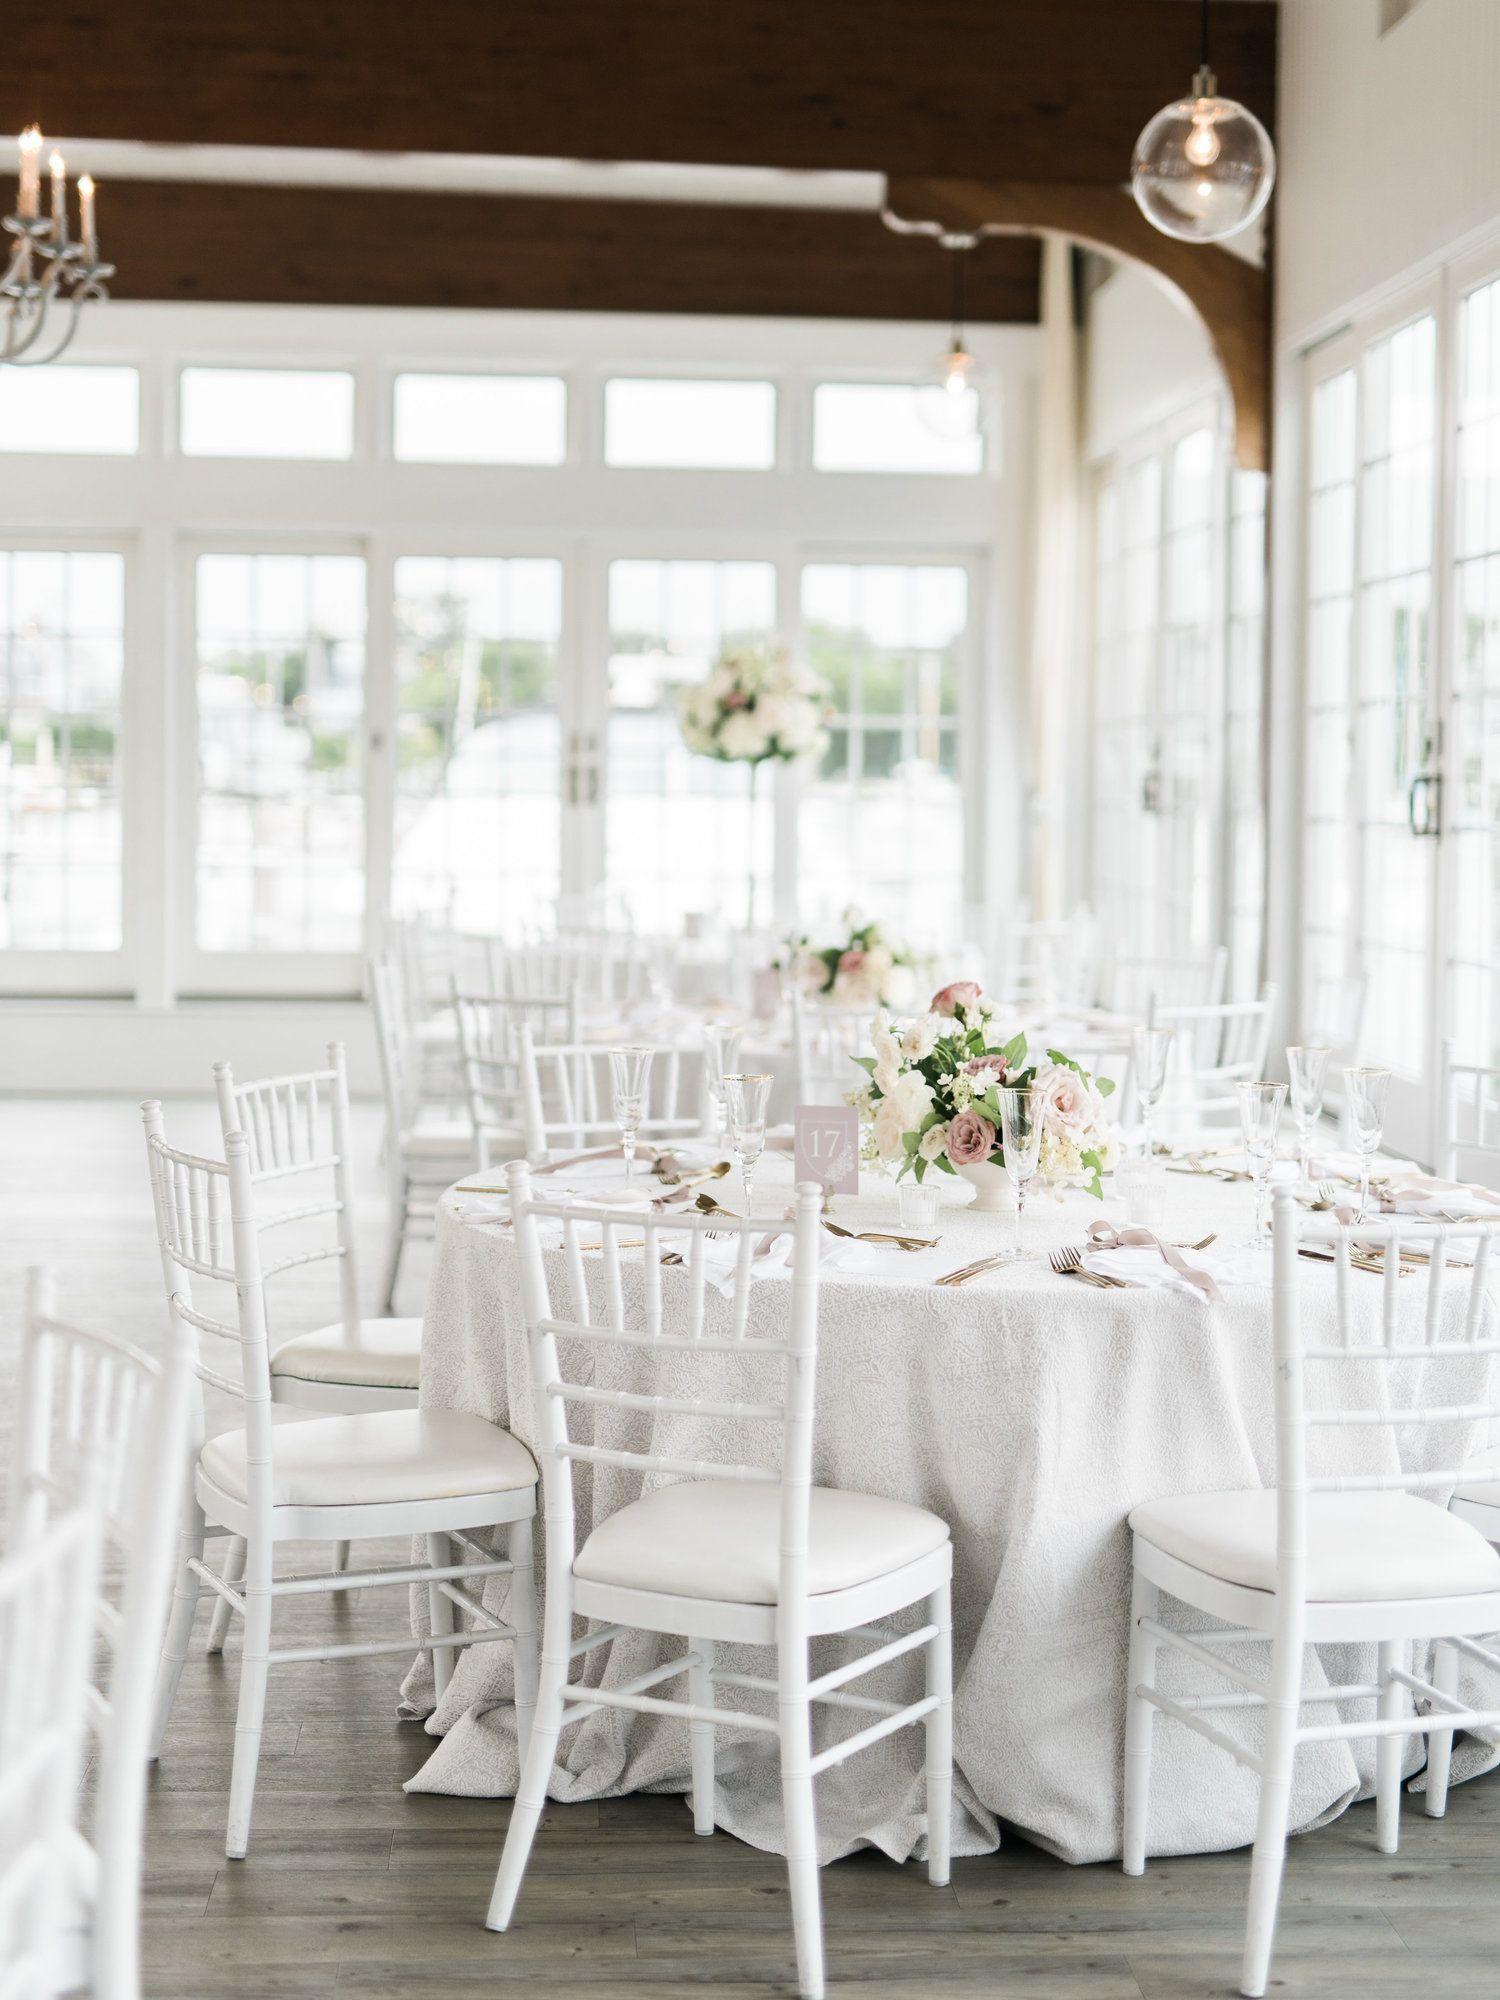 La Tavola Fine Linen Rental Beatrice Garden Smoke With Hemstitch White Napkins Photography Elizabeth L Cape Cod Wedding Wedding Event Planner White Napkins